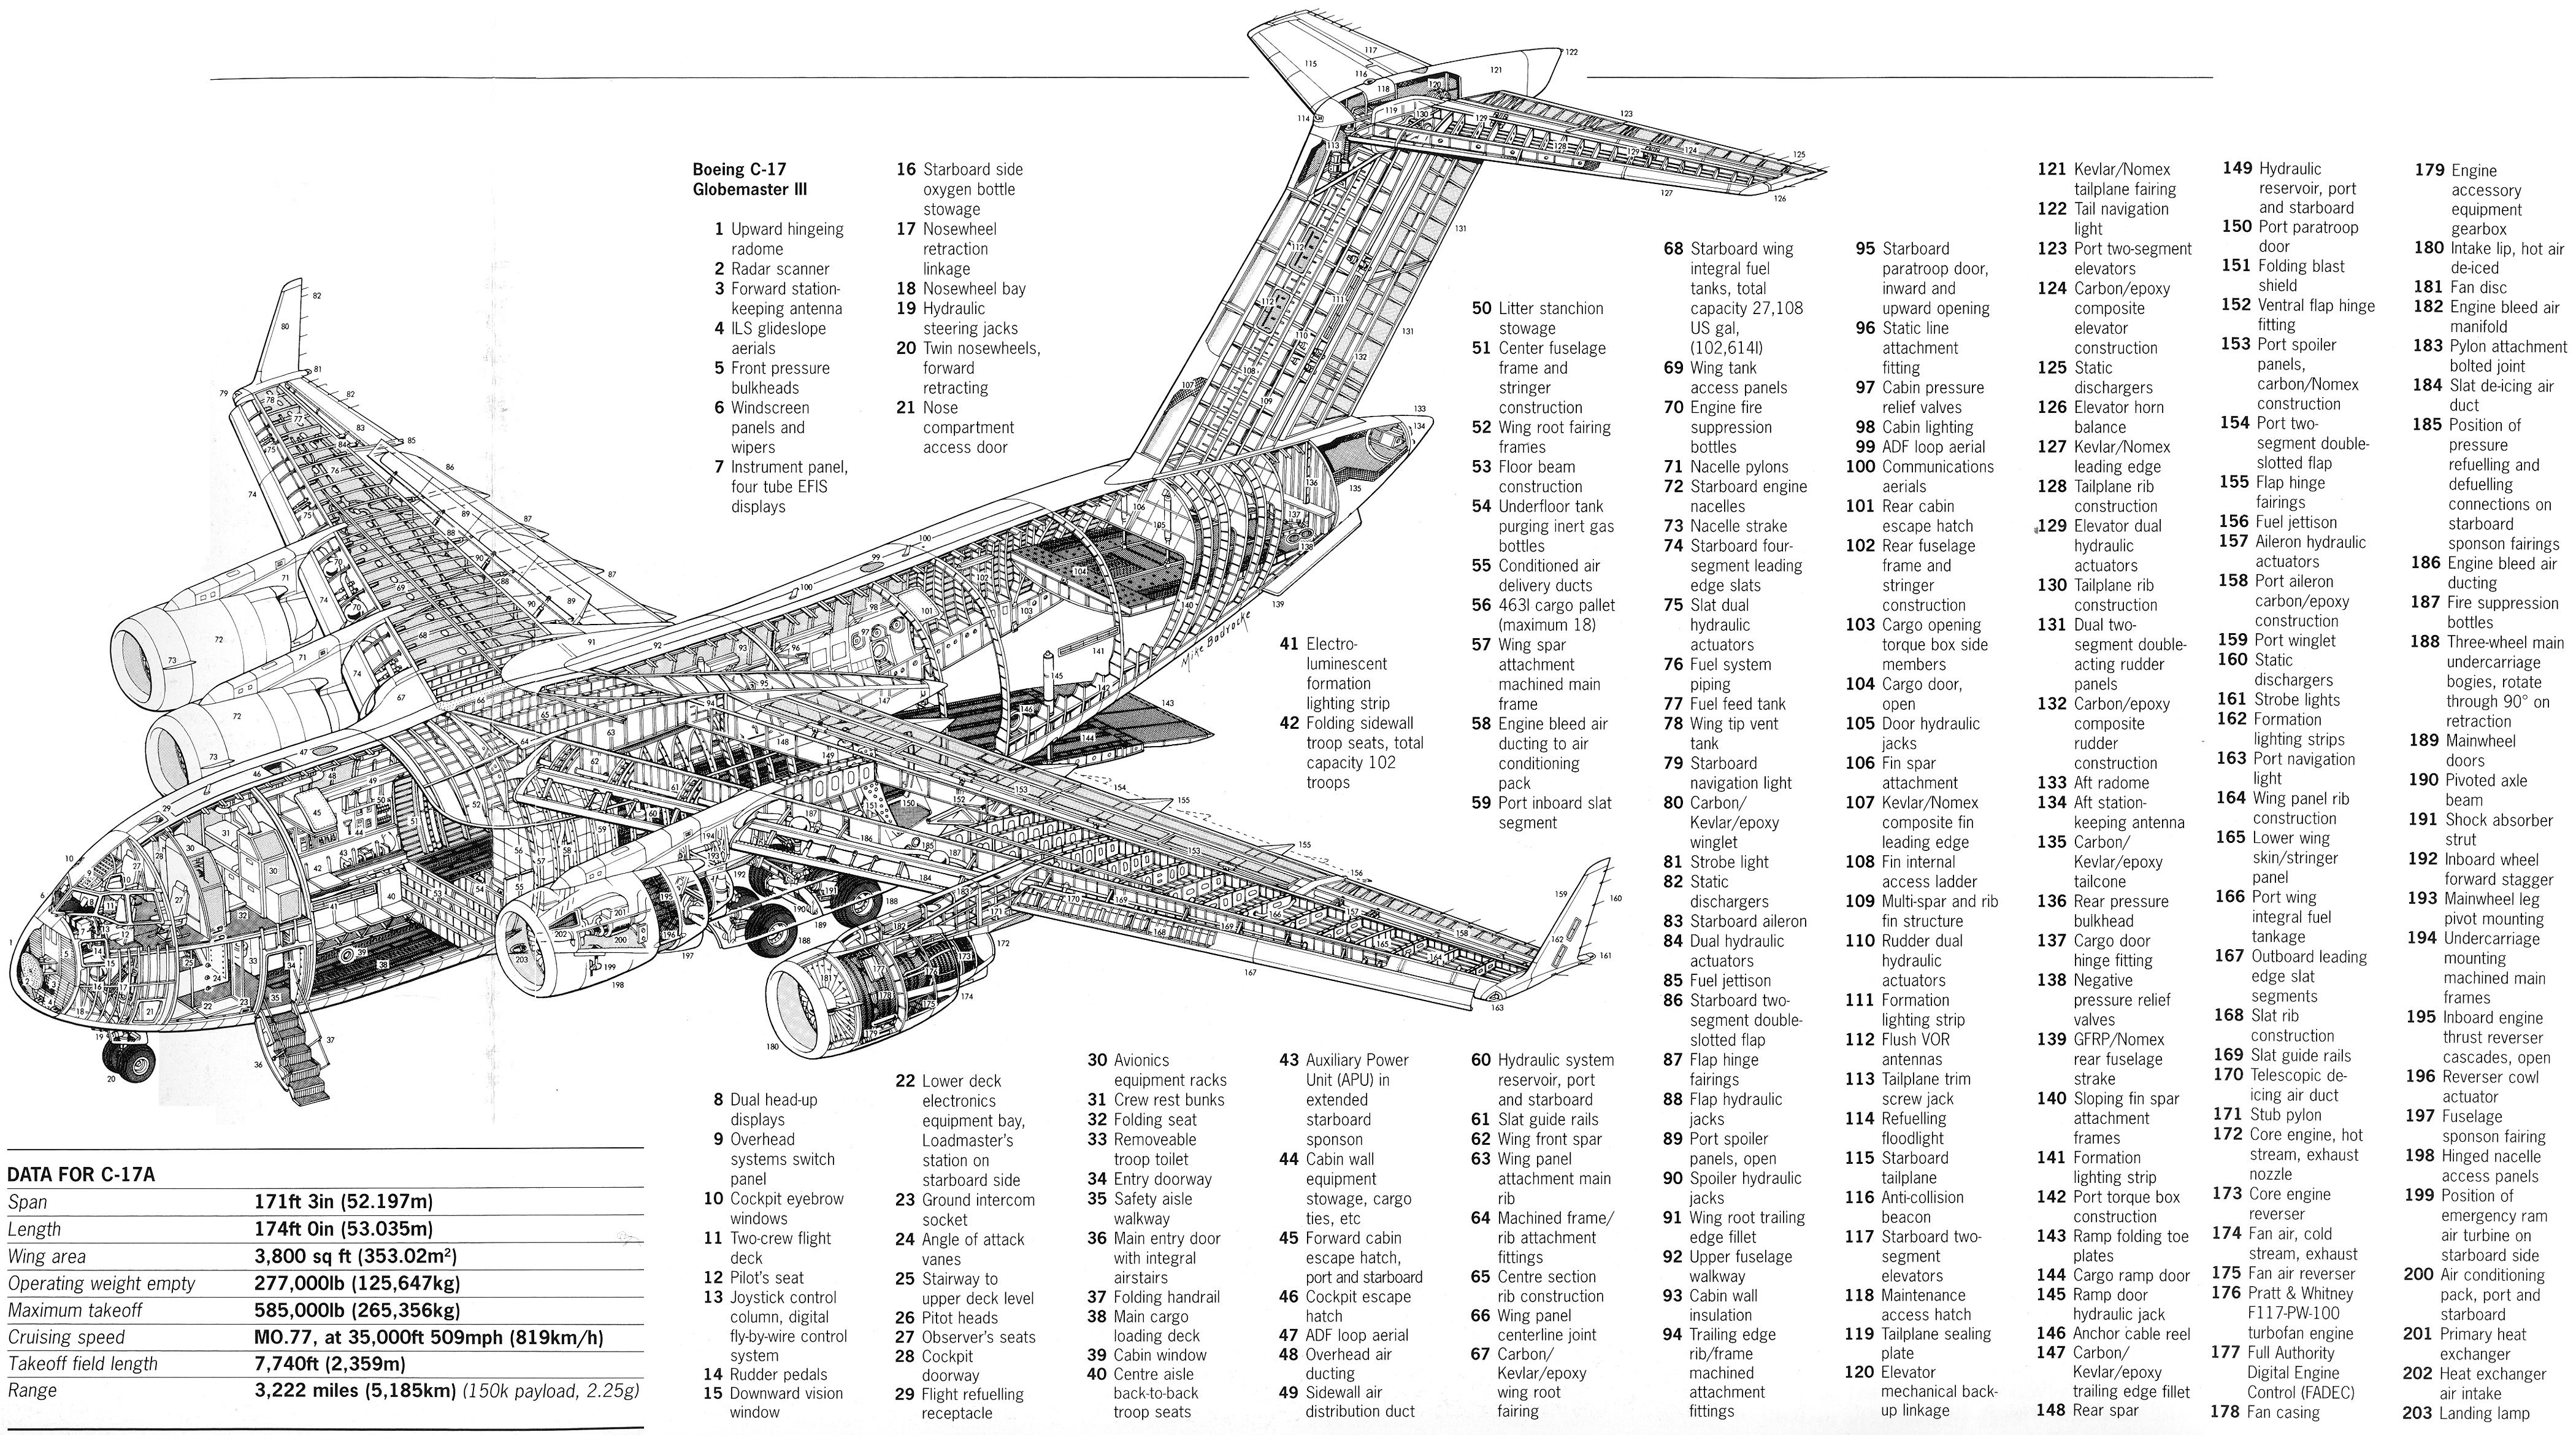 c-17 aircraft blueprints